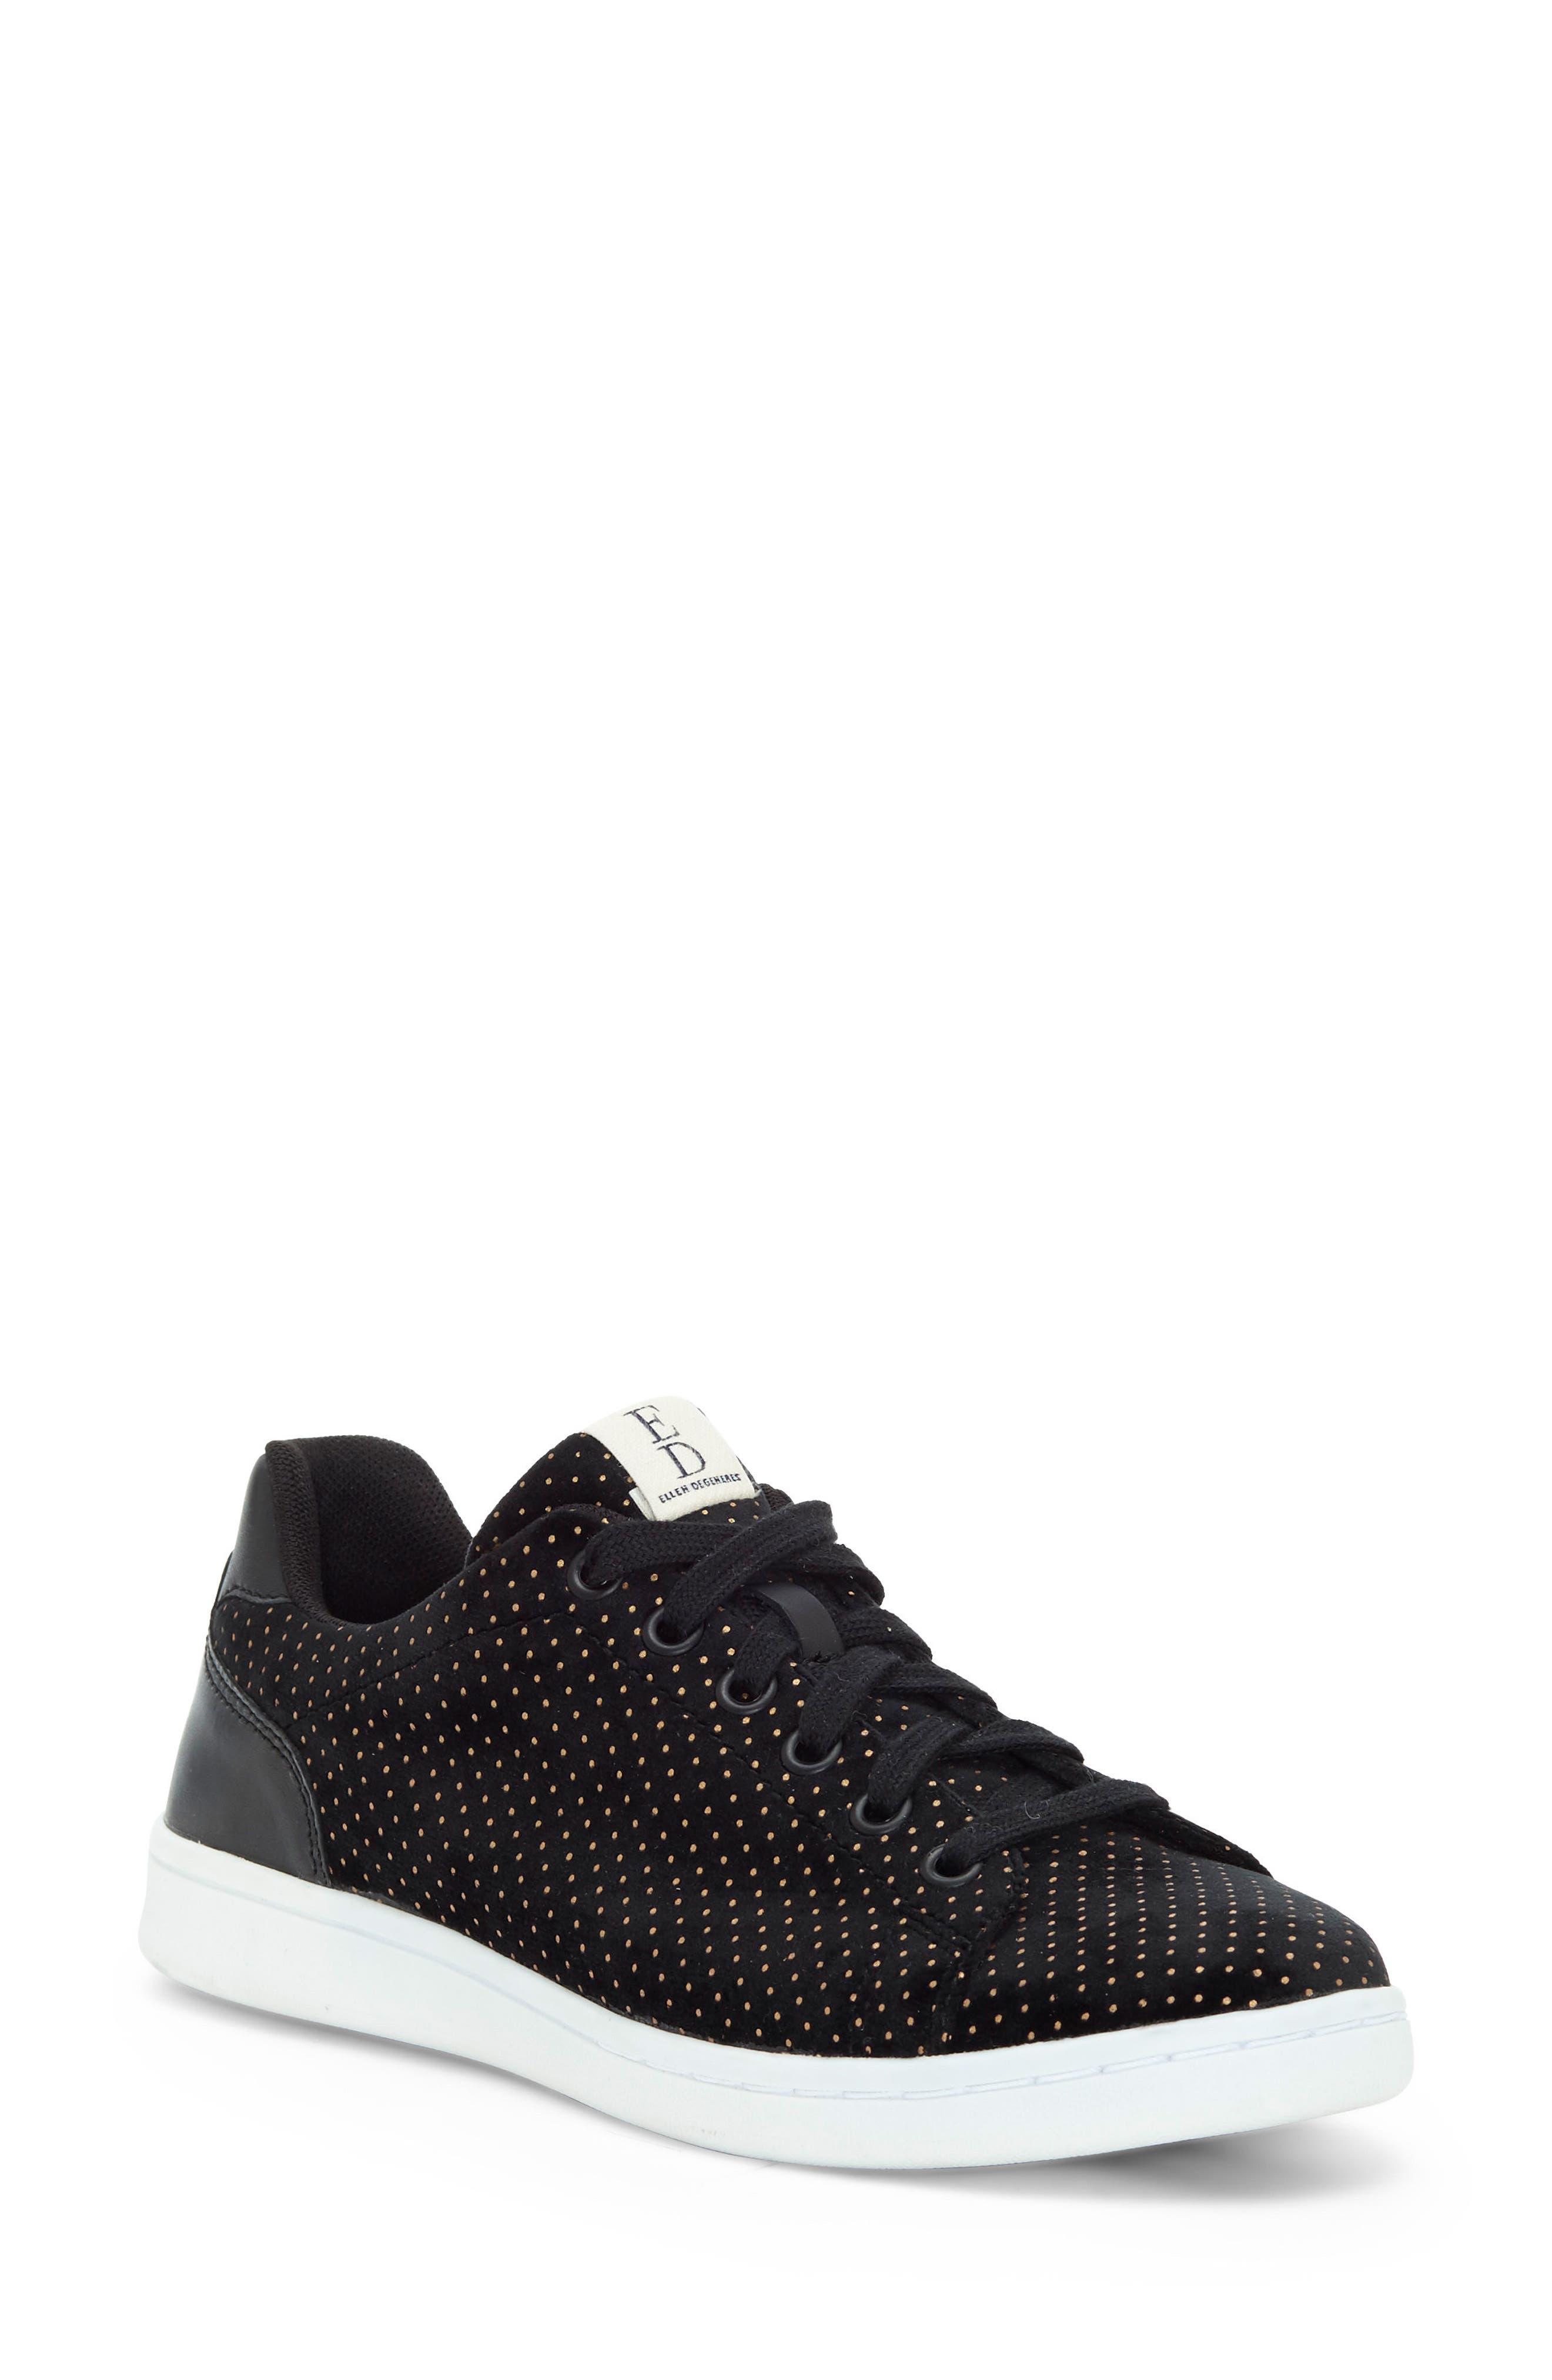 'Chapala' Sneaker,                             Main thumbnail 1, color,                             Black/ Gold Velvet